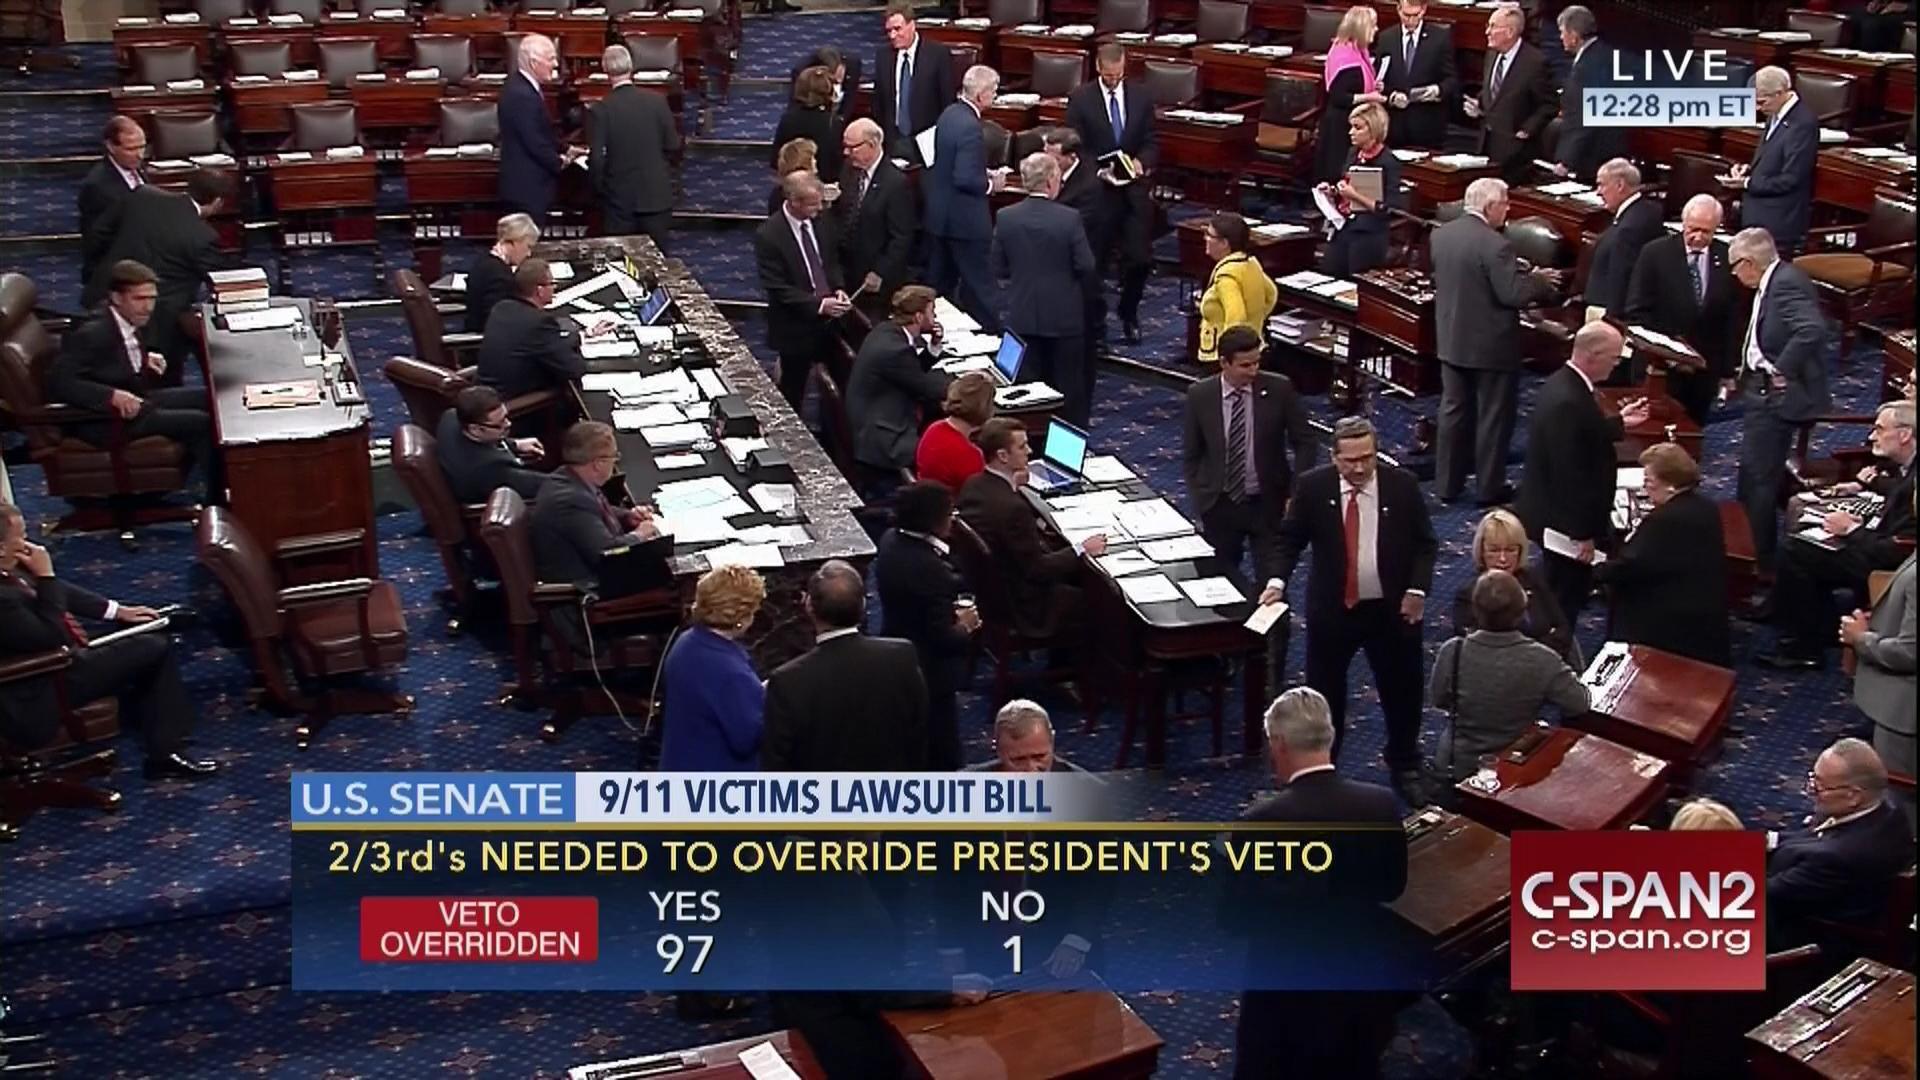 Congress rebukes Obama, overrides veto of 9/11 legislation